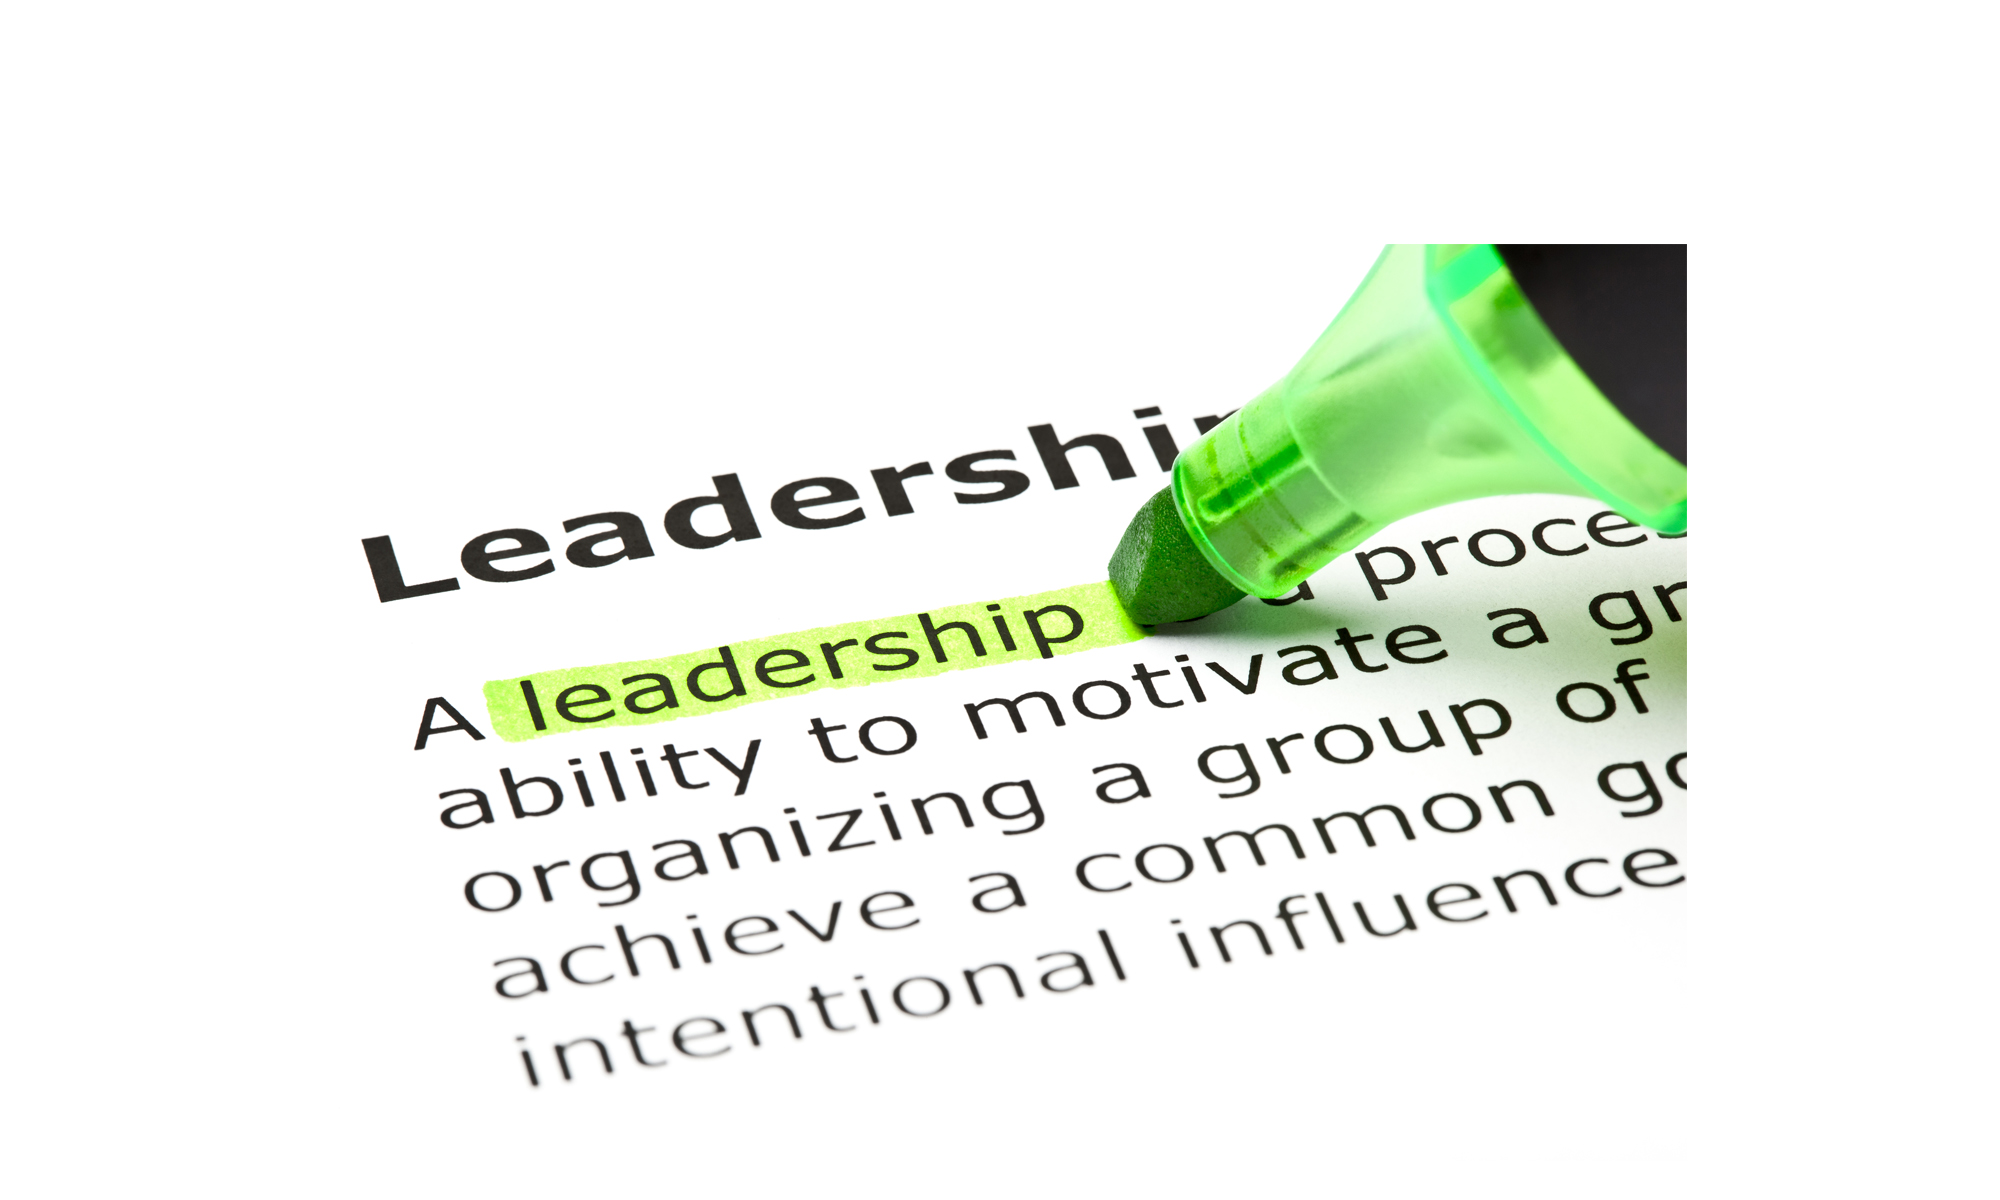 Esistono diverse tipologie di coaching: life, business ed executive